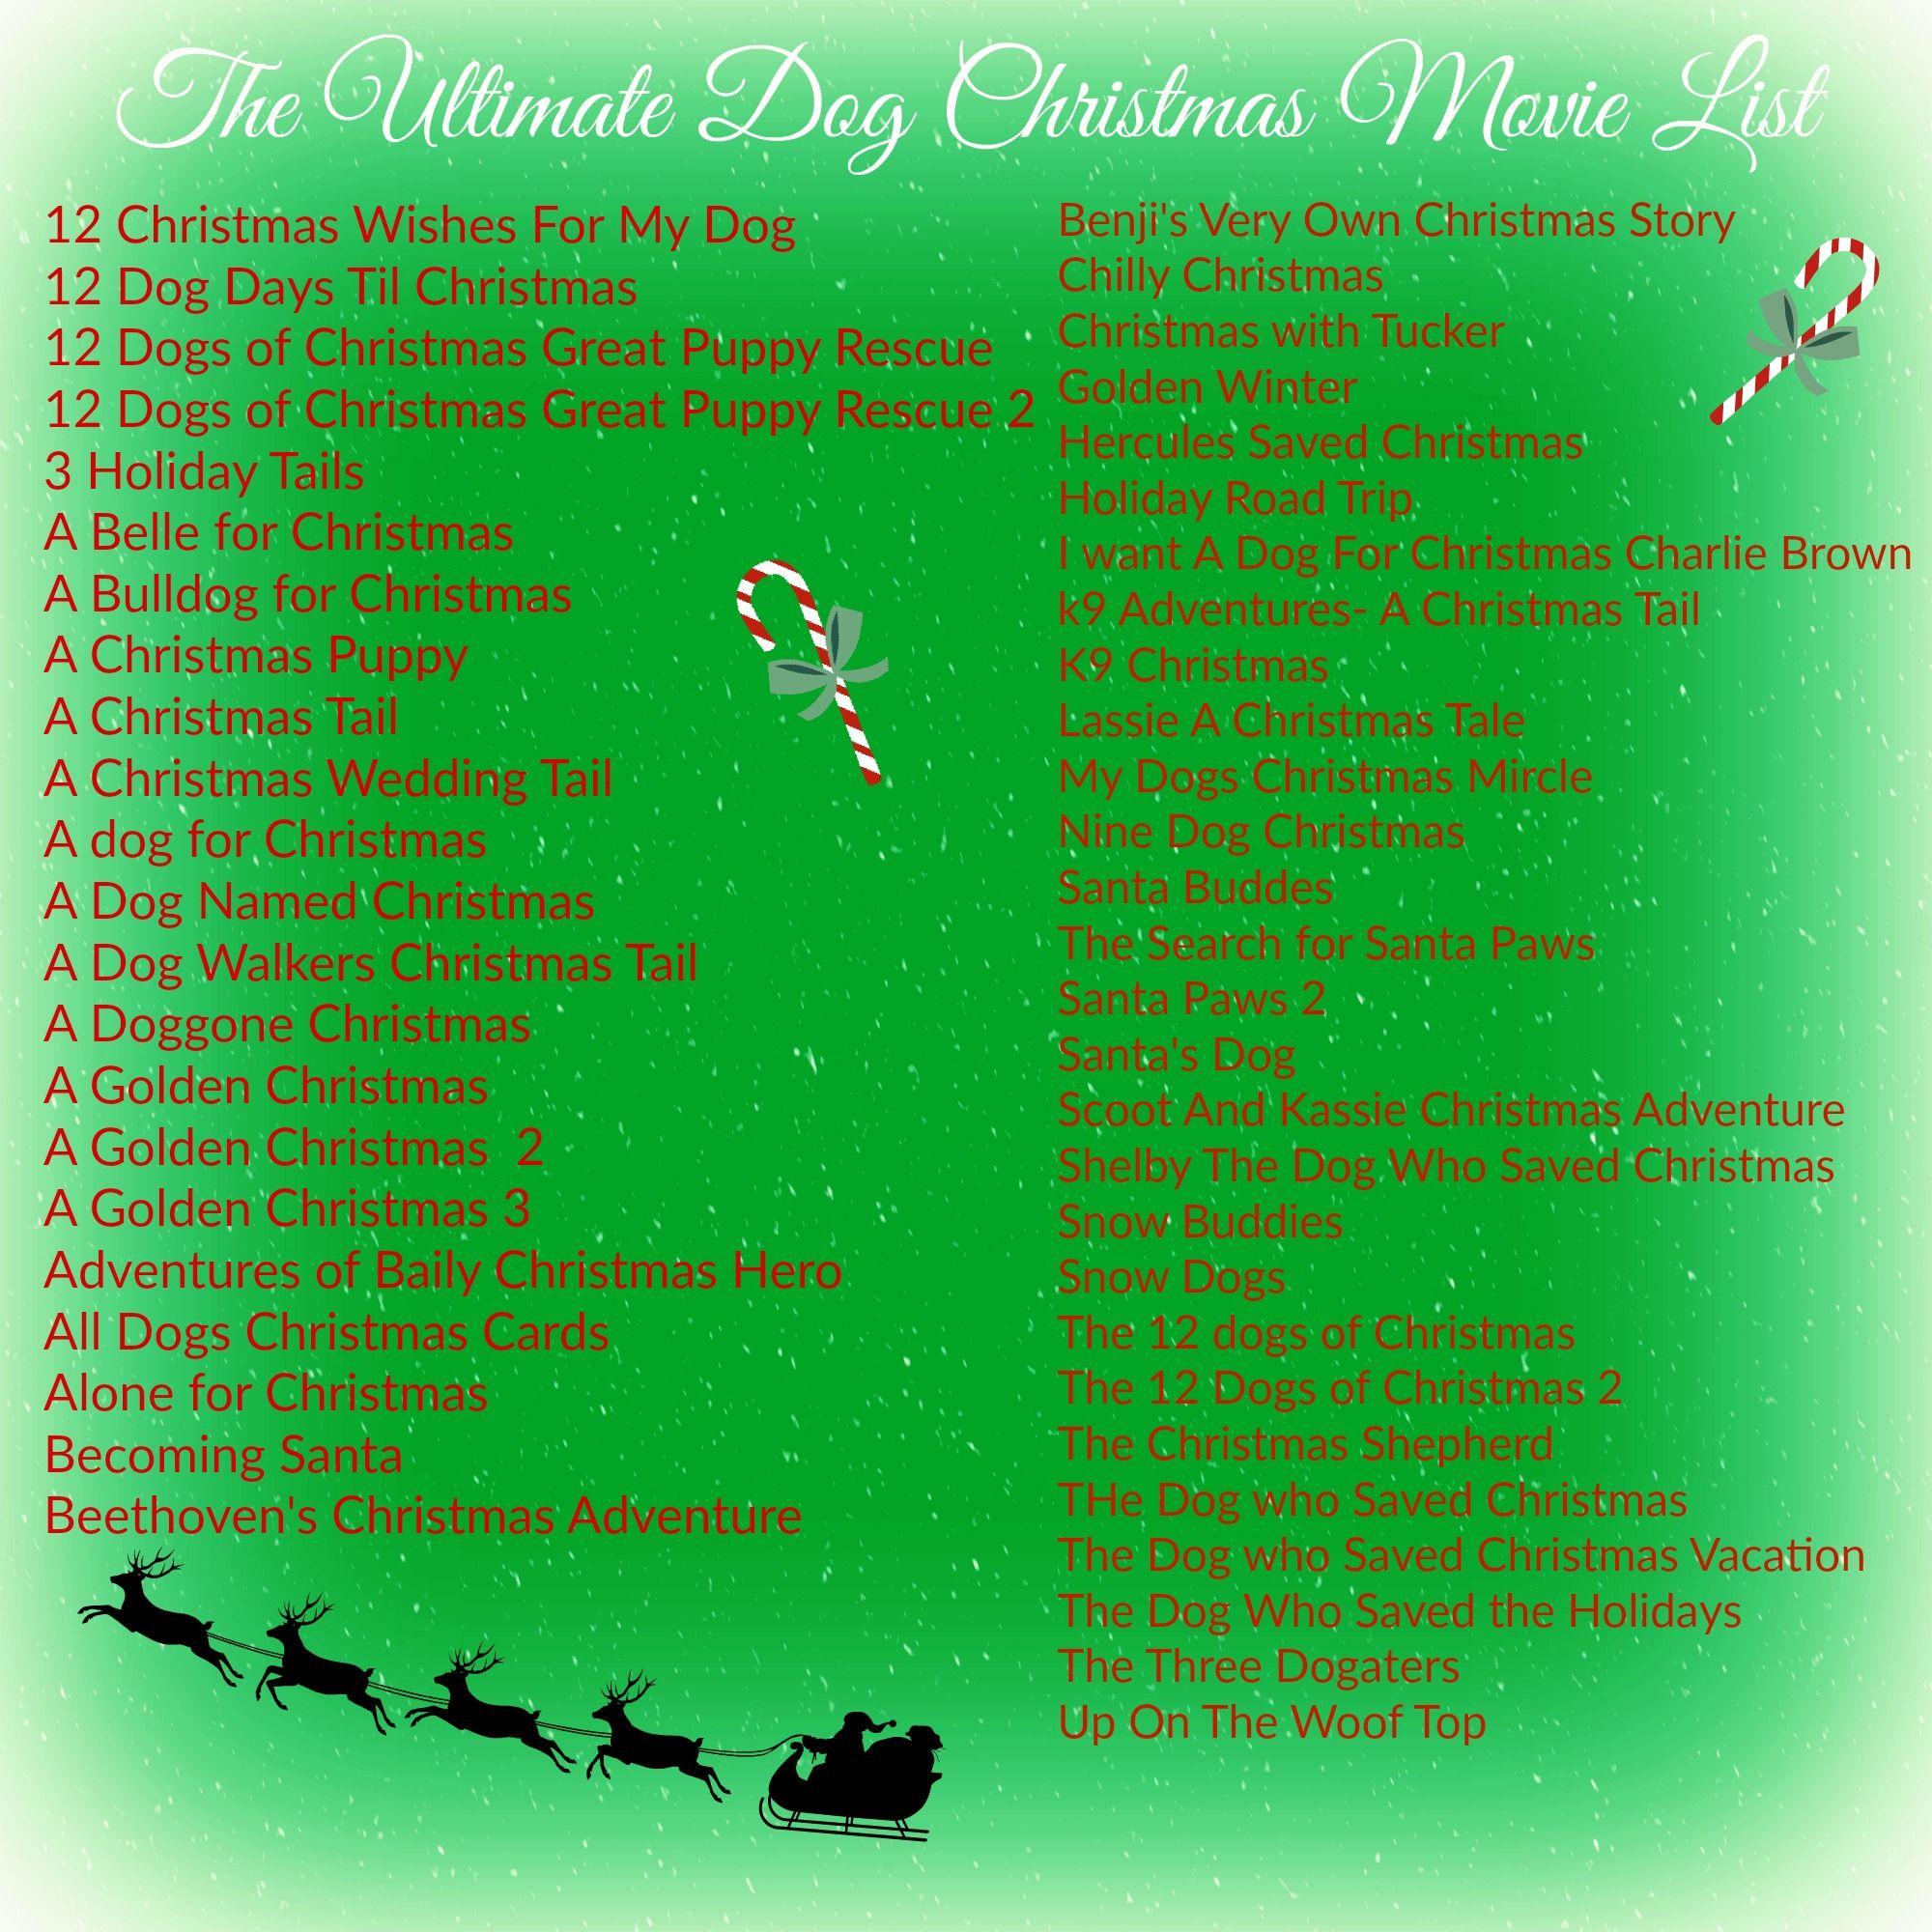 Dog Christmas Movie List Holidays Dogs Christmas Movies Christmas Dog Christmas Movies List Pet Holiday